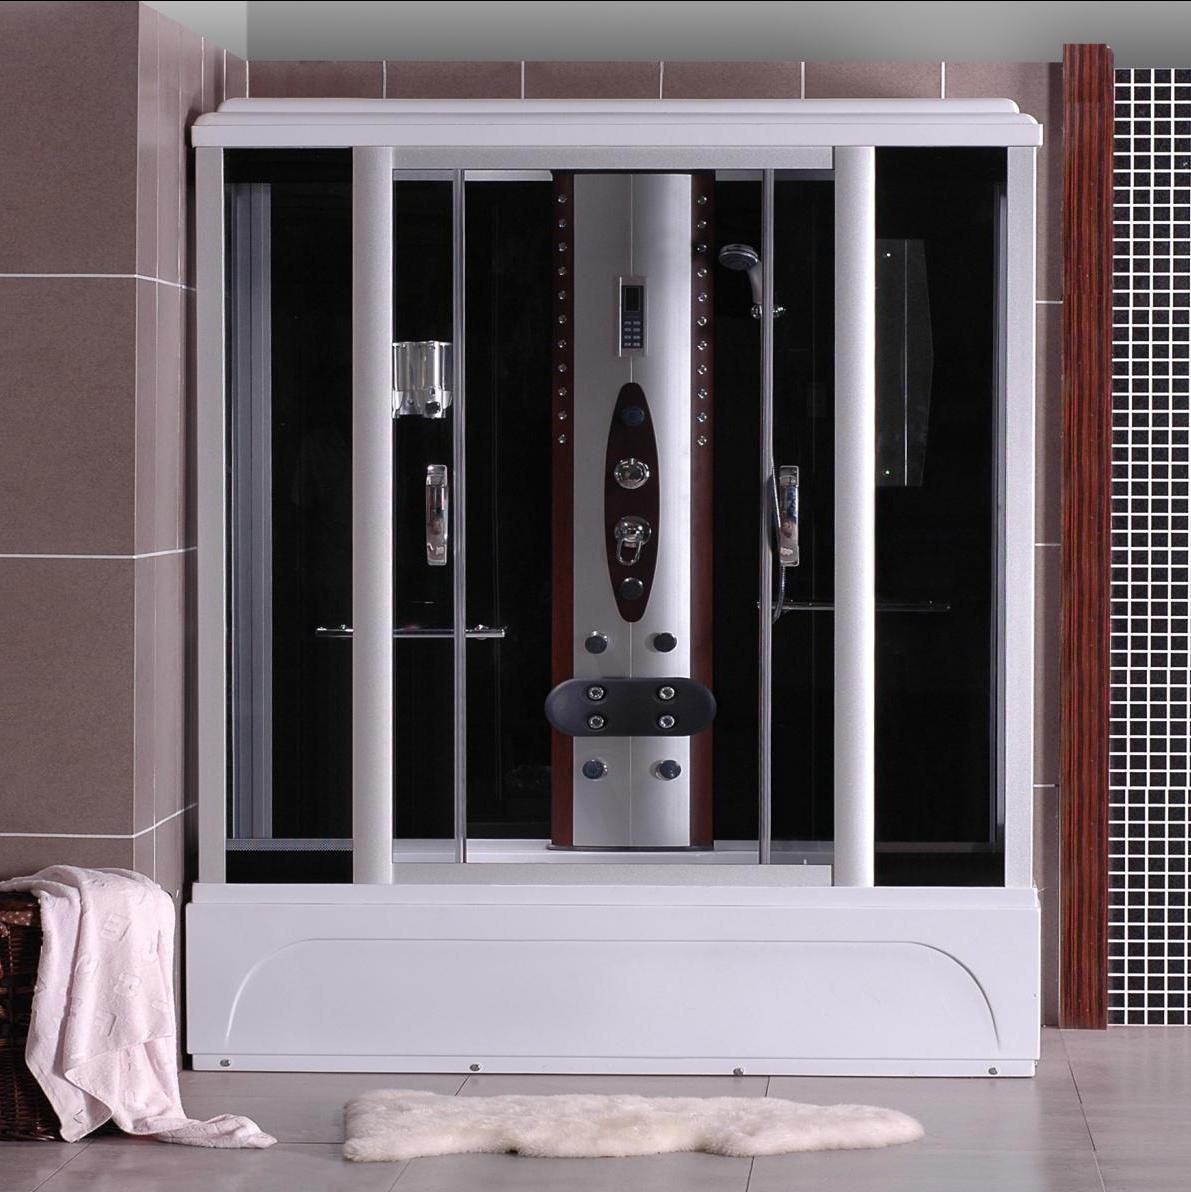 Great la vasca con doccia vasca con doccia integrata hs - Bagno doccia vasca ...